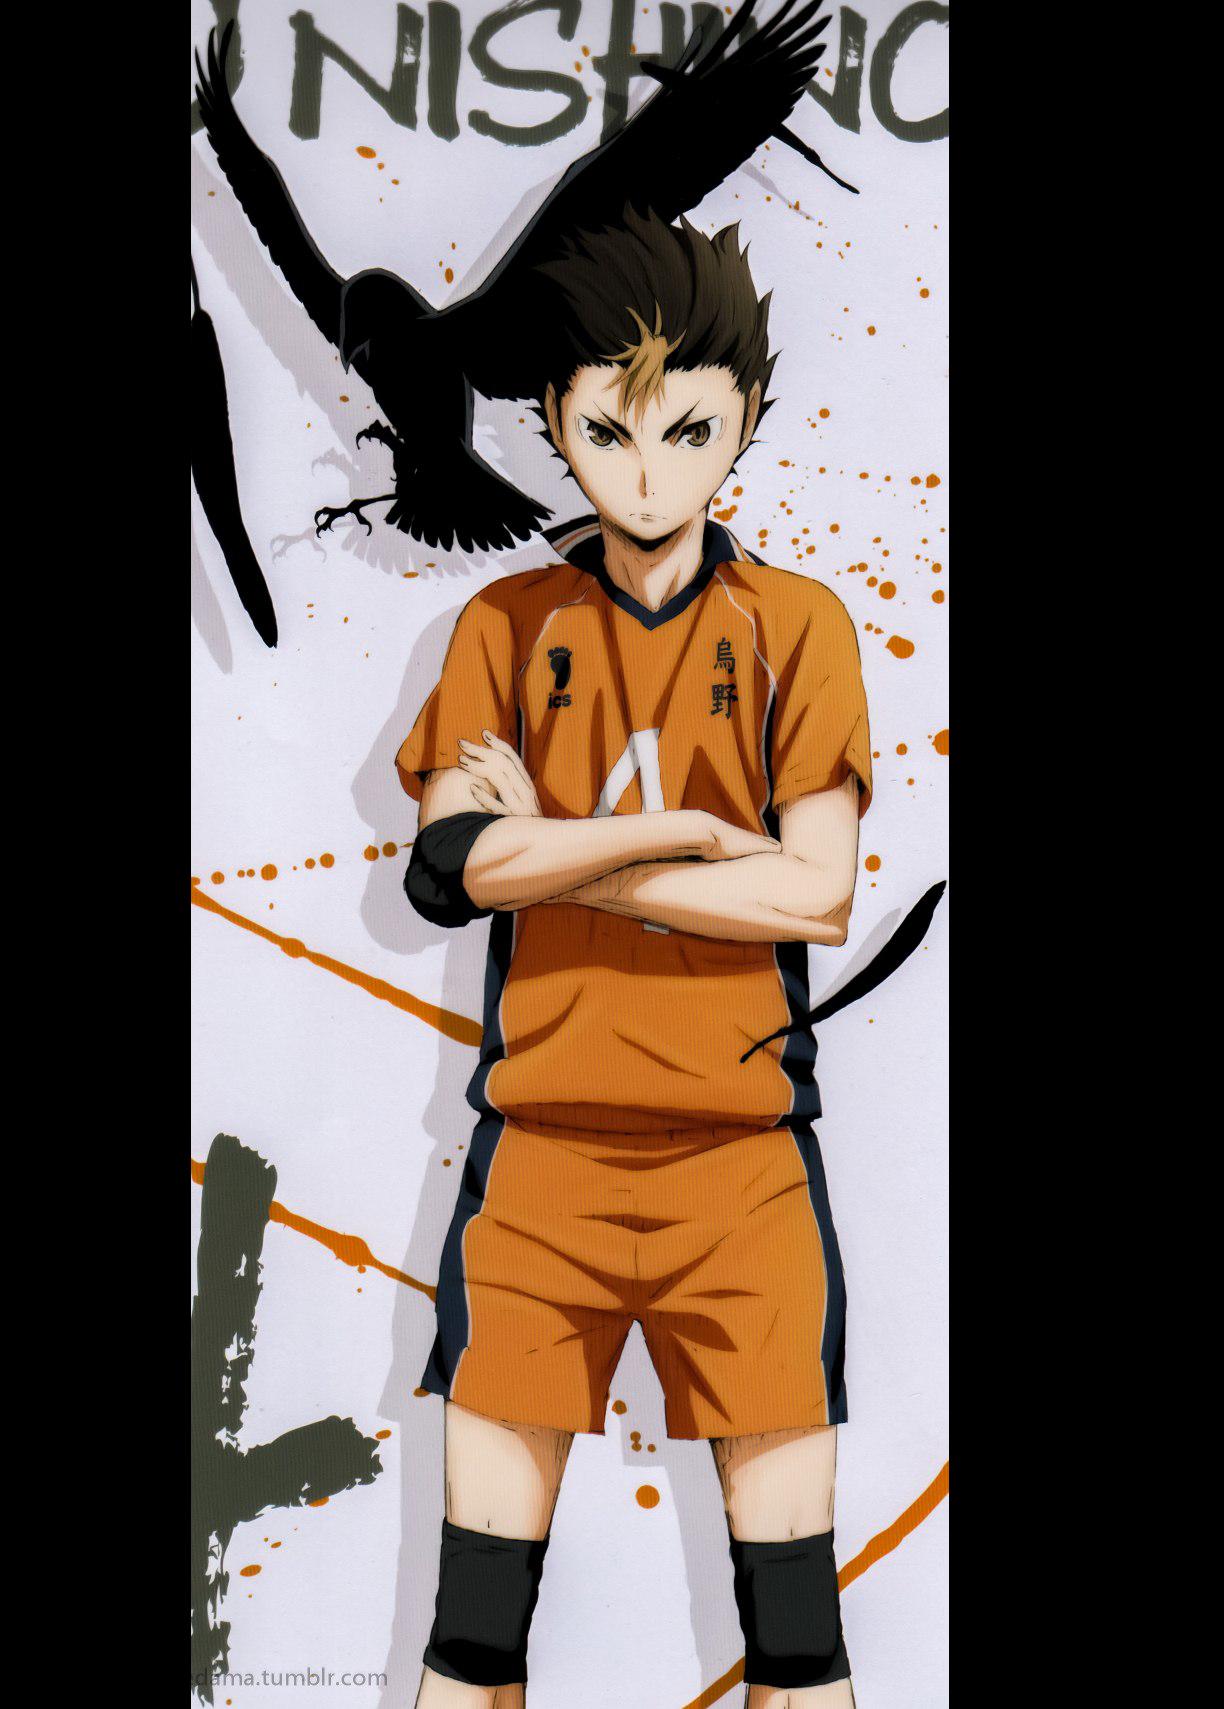 Nishinoya Yuu Karasuno Haikyuu Haikyuu Anime Nishinoya Haikyuu